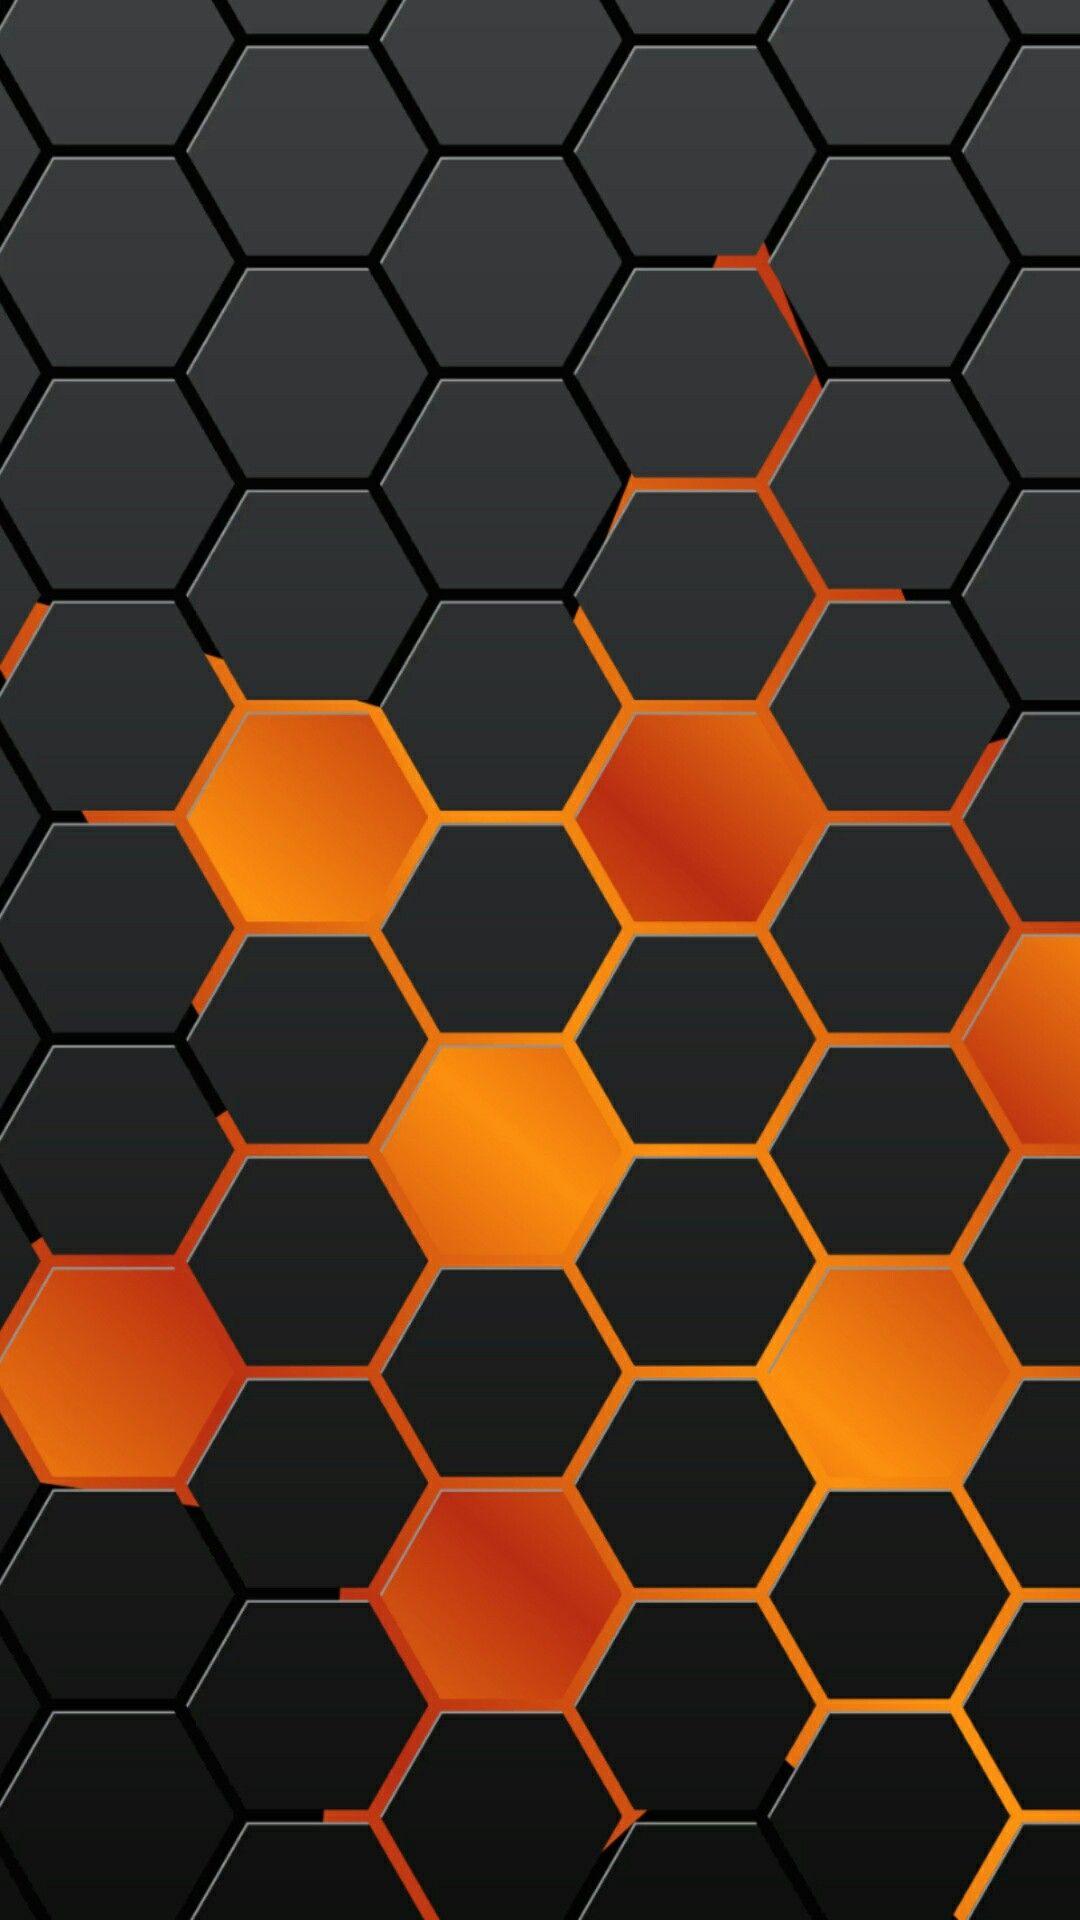 Pin By Kentaro Nishioka On Wallpapers For Samsung Orange Wallpaper Abstract Iphone Wallpaper Iphone Wallpaper Pattern